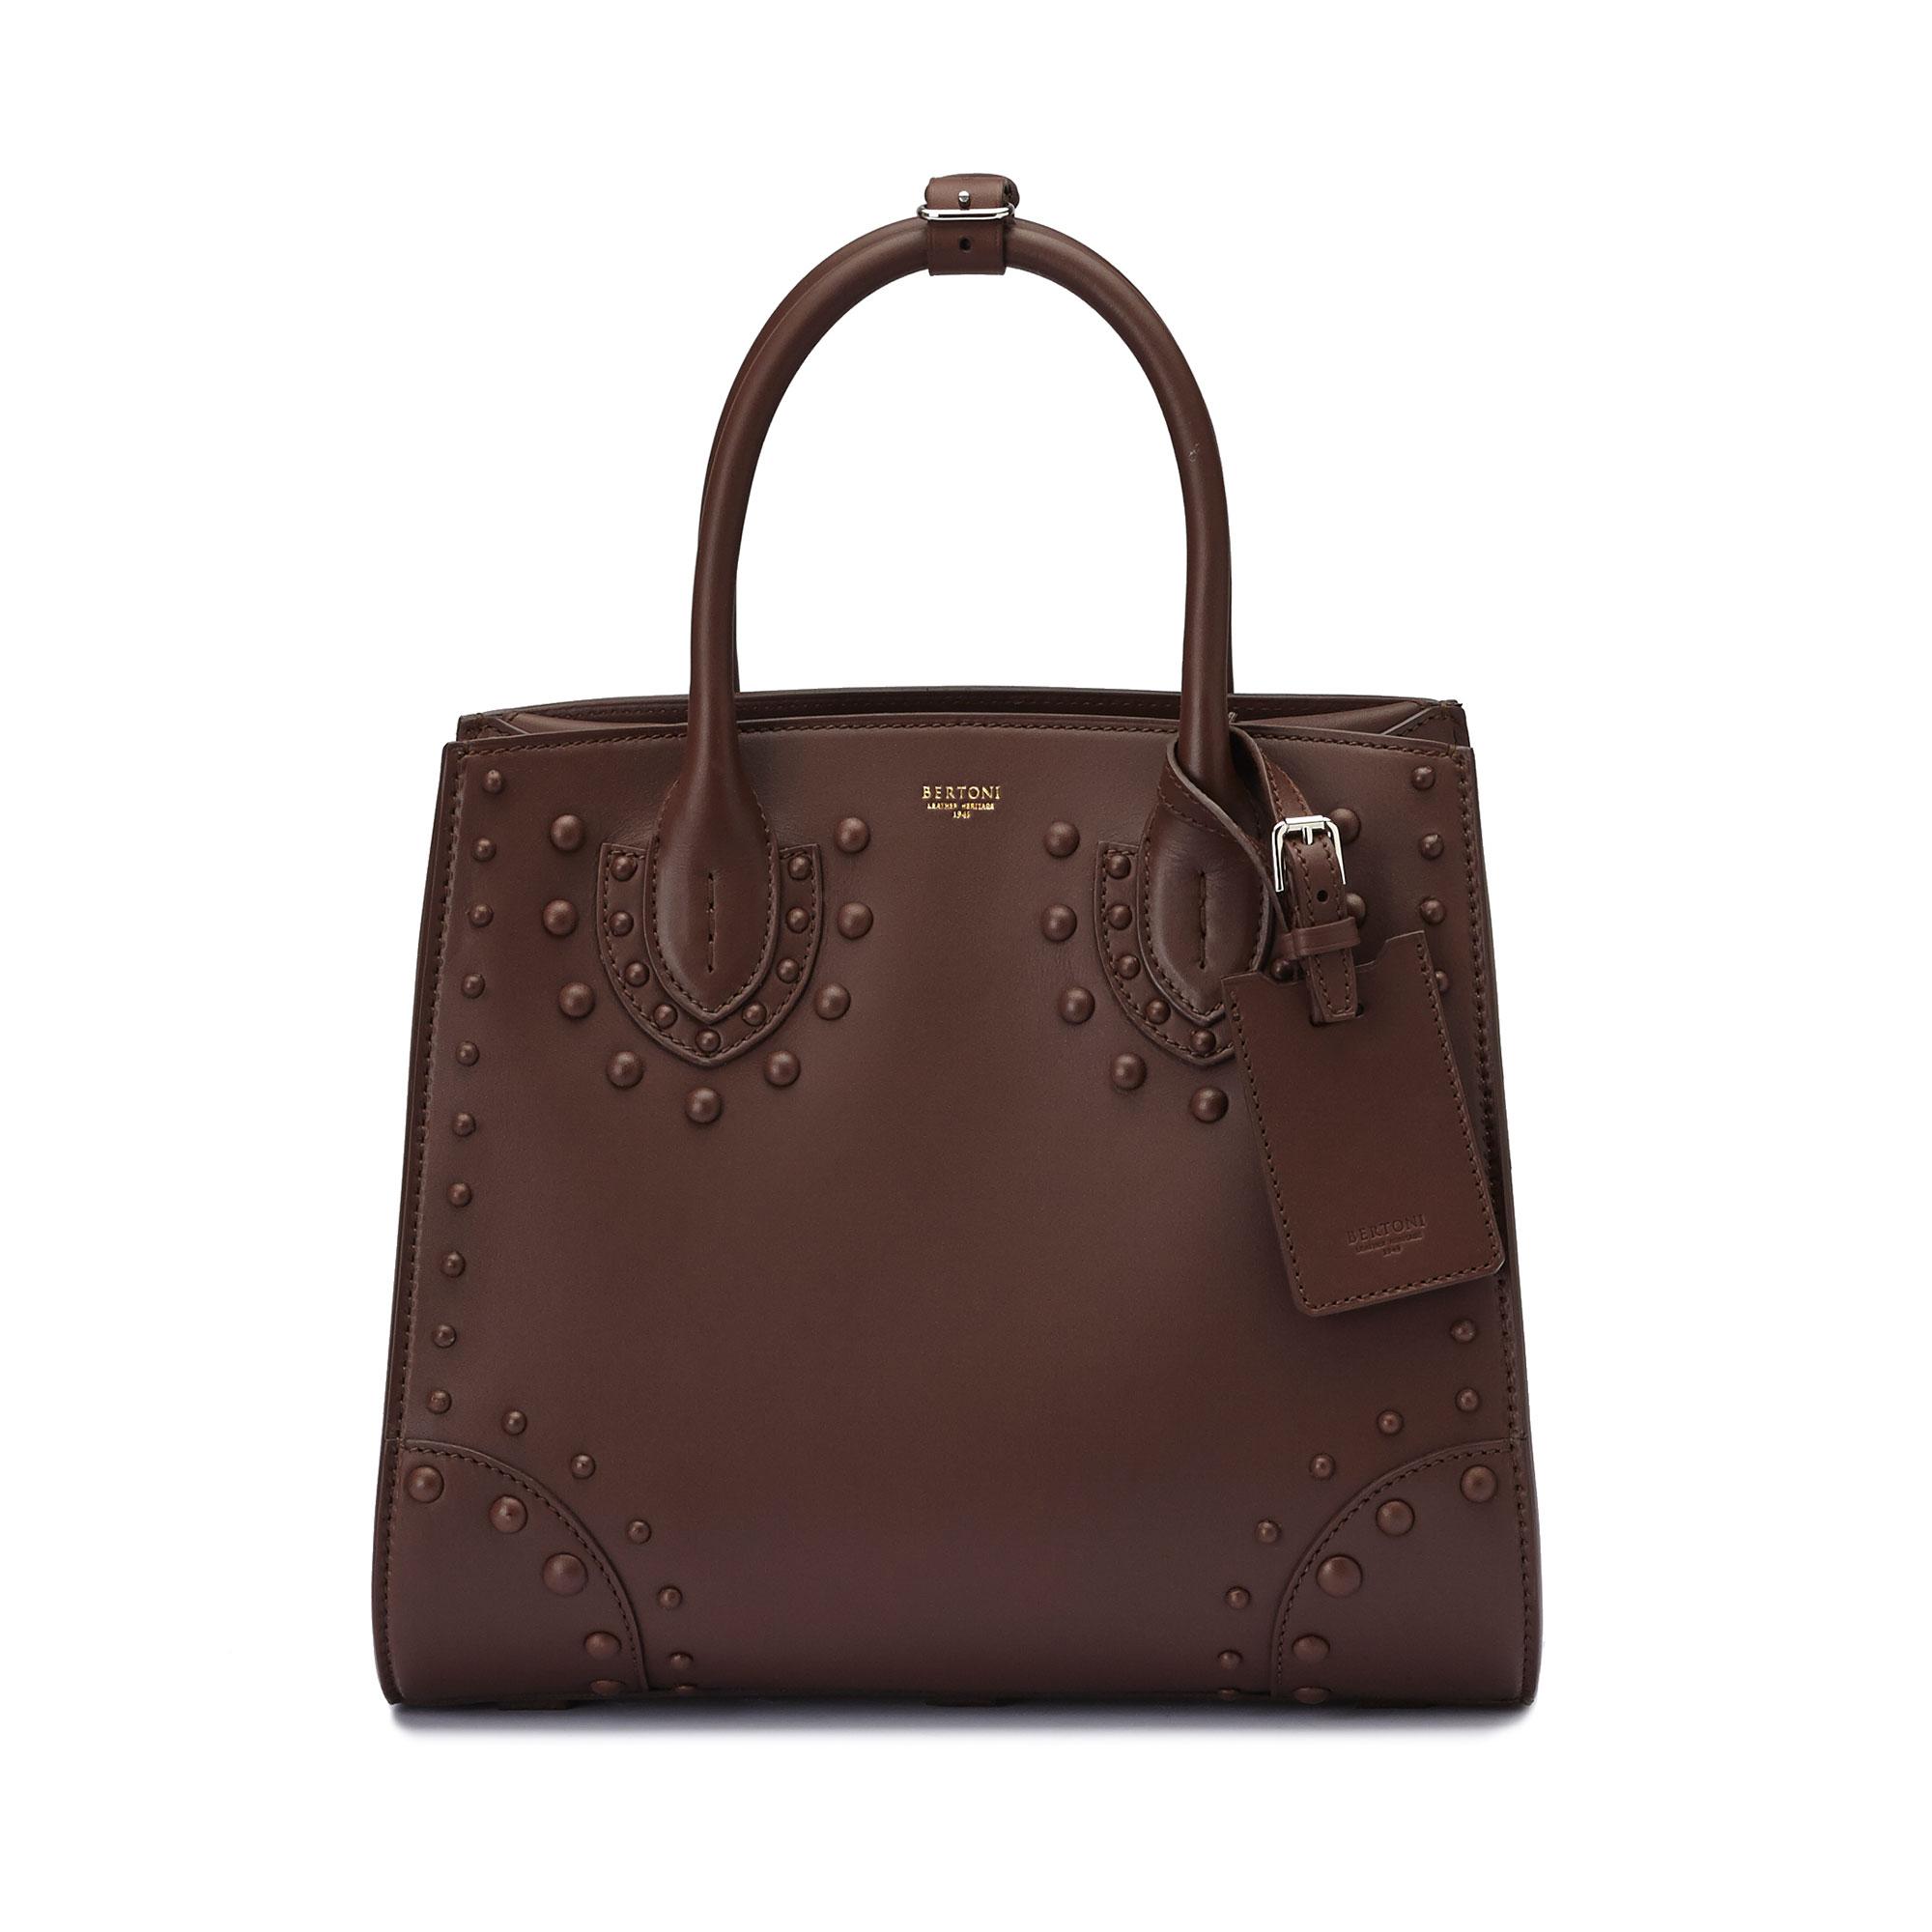 The brown french calf Darcy medium bag by Bertoni 1949 02